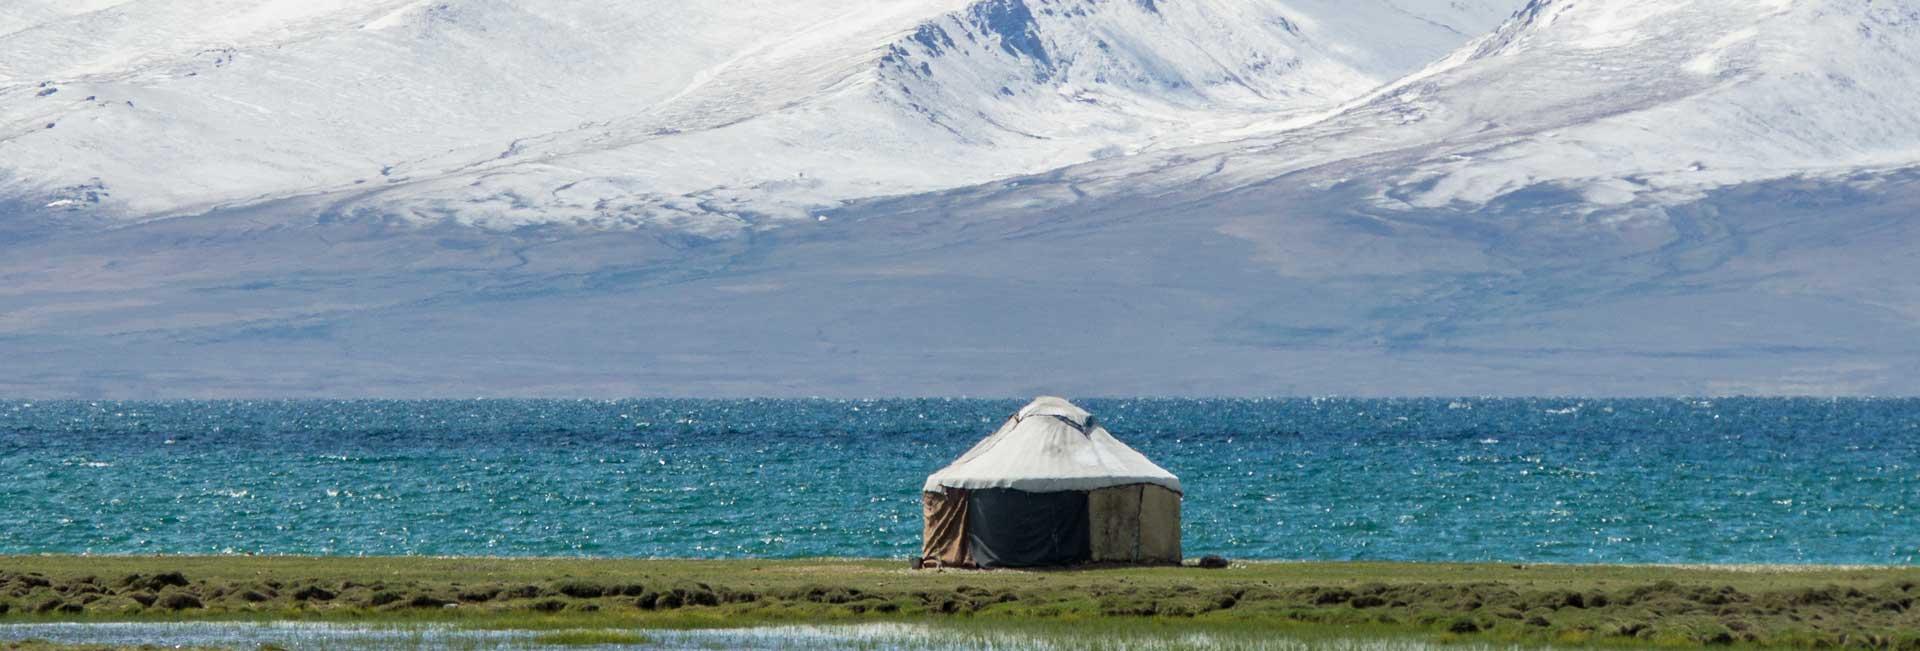 Yurt in Son Kul, Kyrgyzstan. Photo credit: Andra Artemova